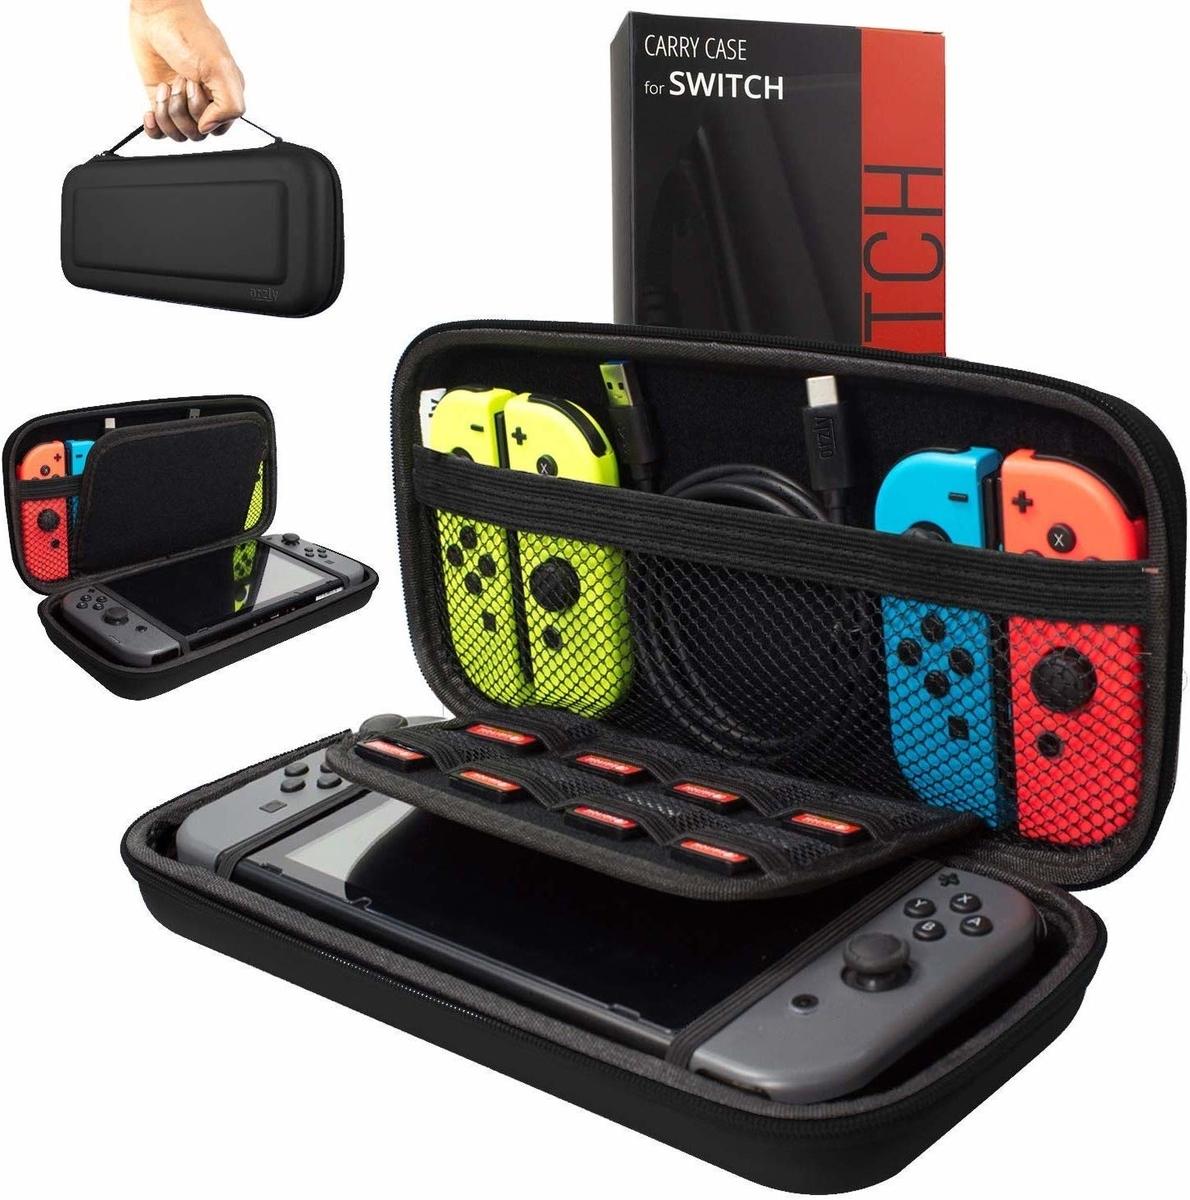 f:id:NintendoDaily:20190813194201j:plain